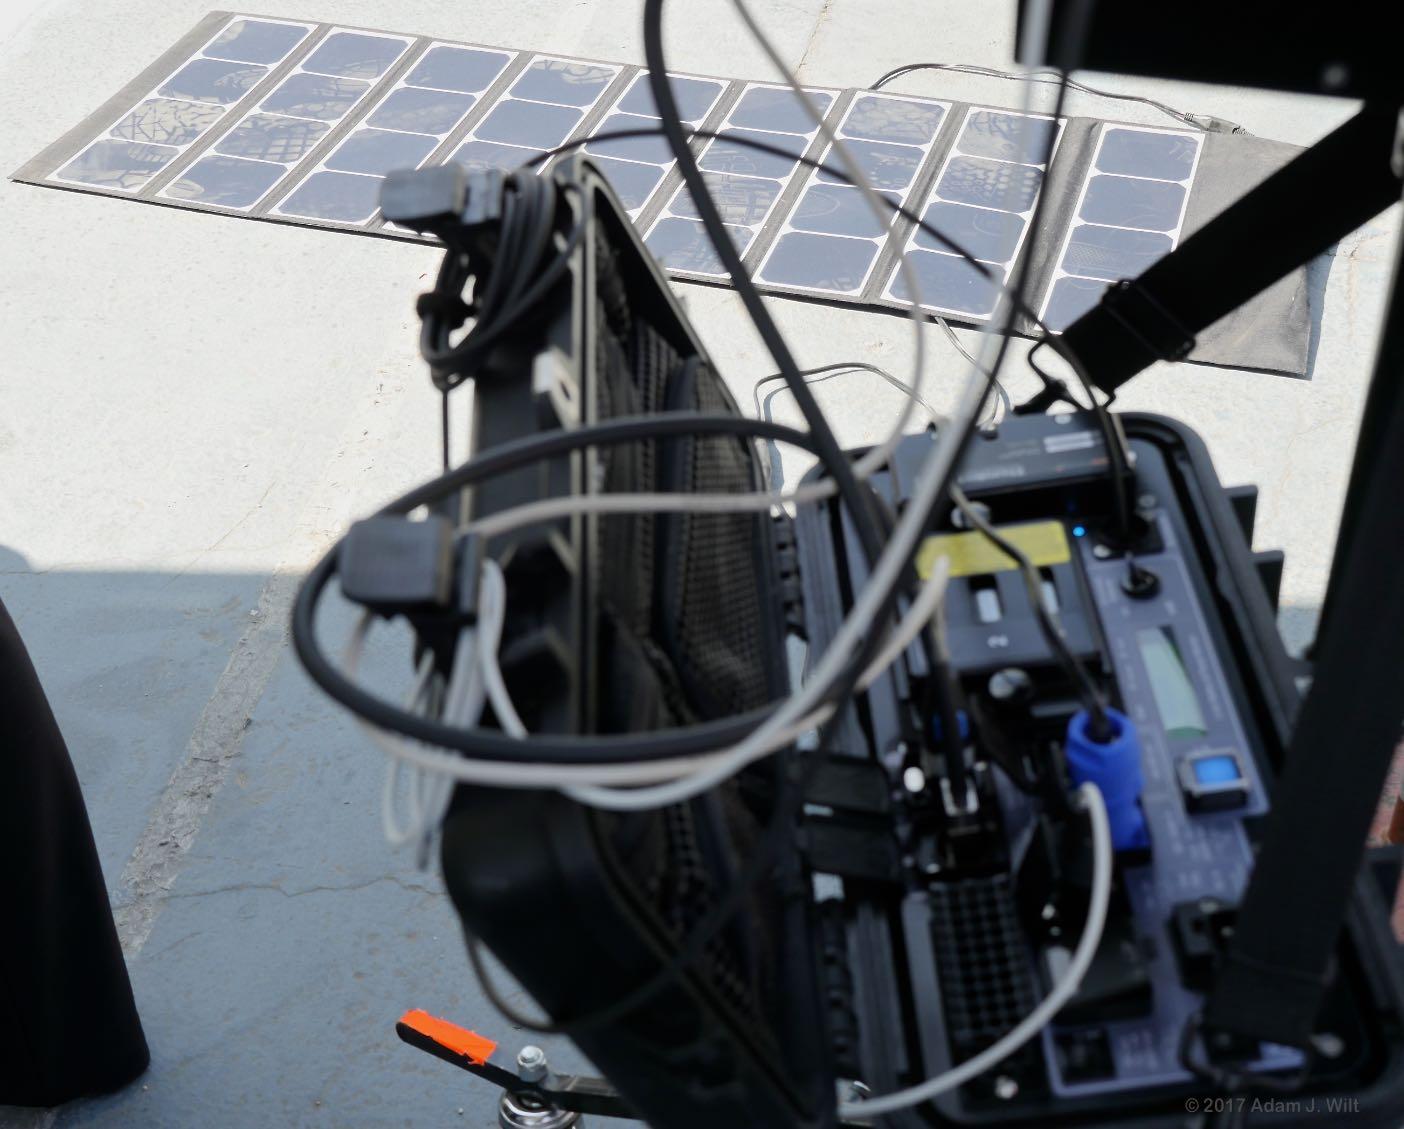 Acromove ThunderPack with solar-power array